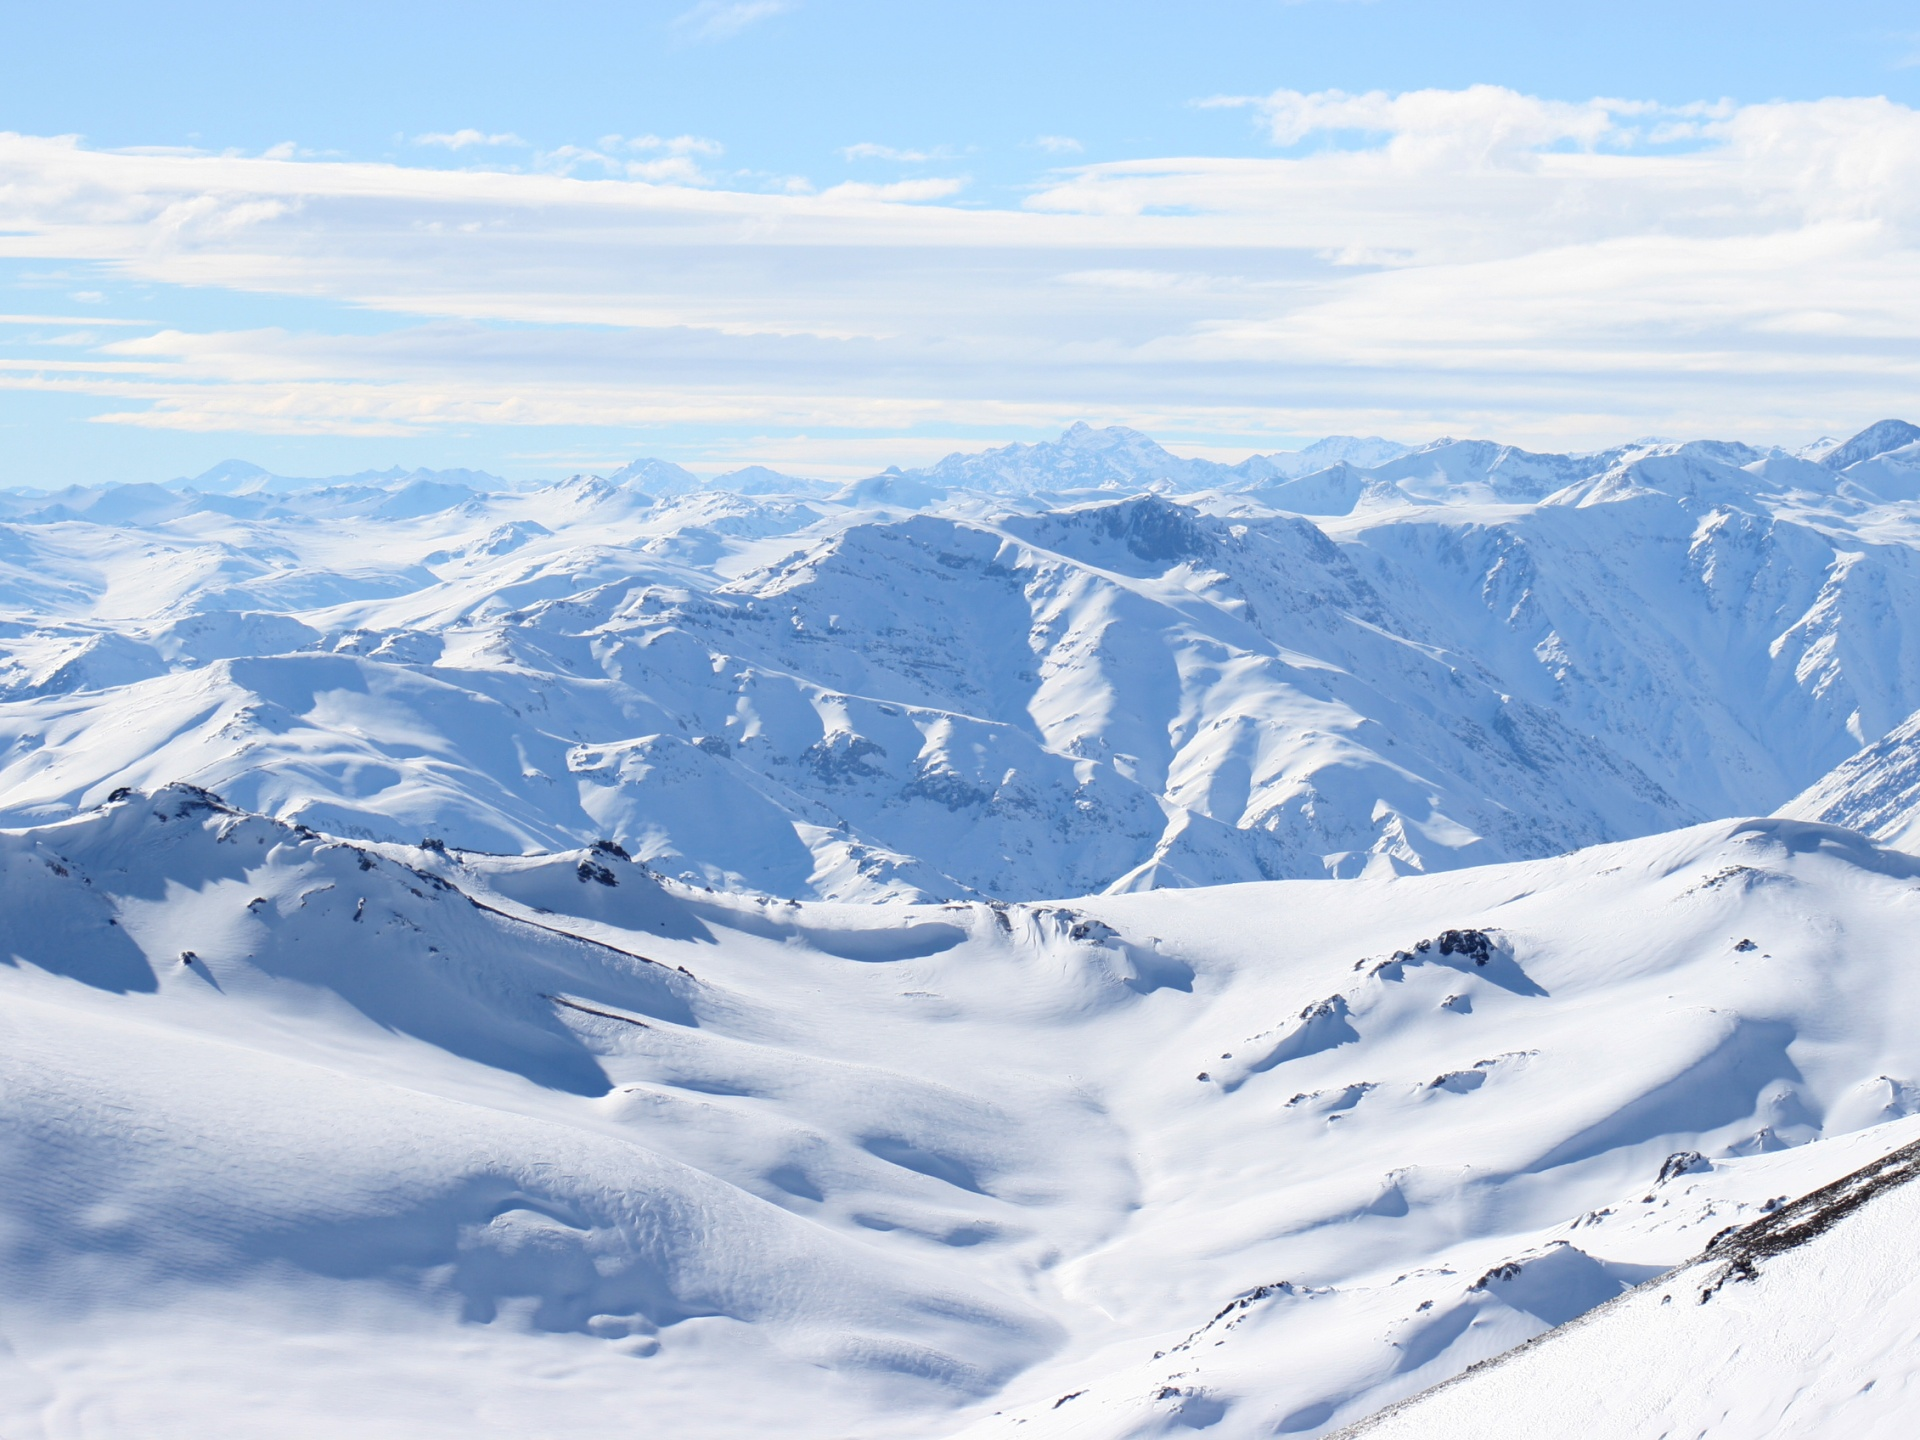 White snowy mountains Wallpaper | 1920x1440 | ID:25559 ...